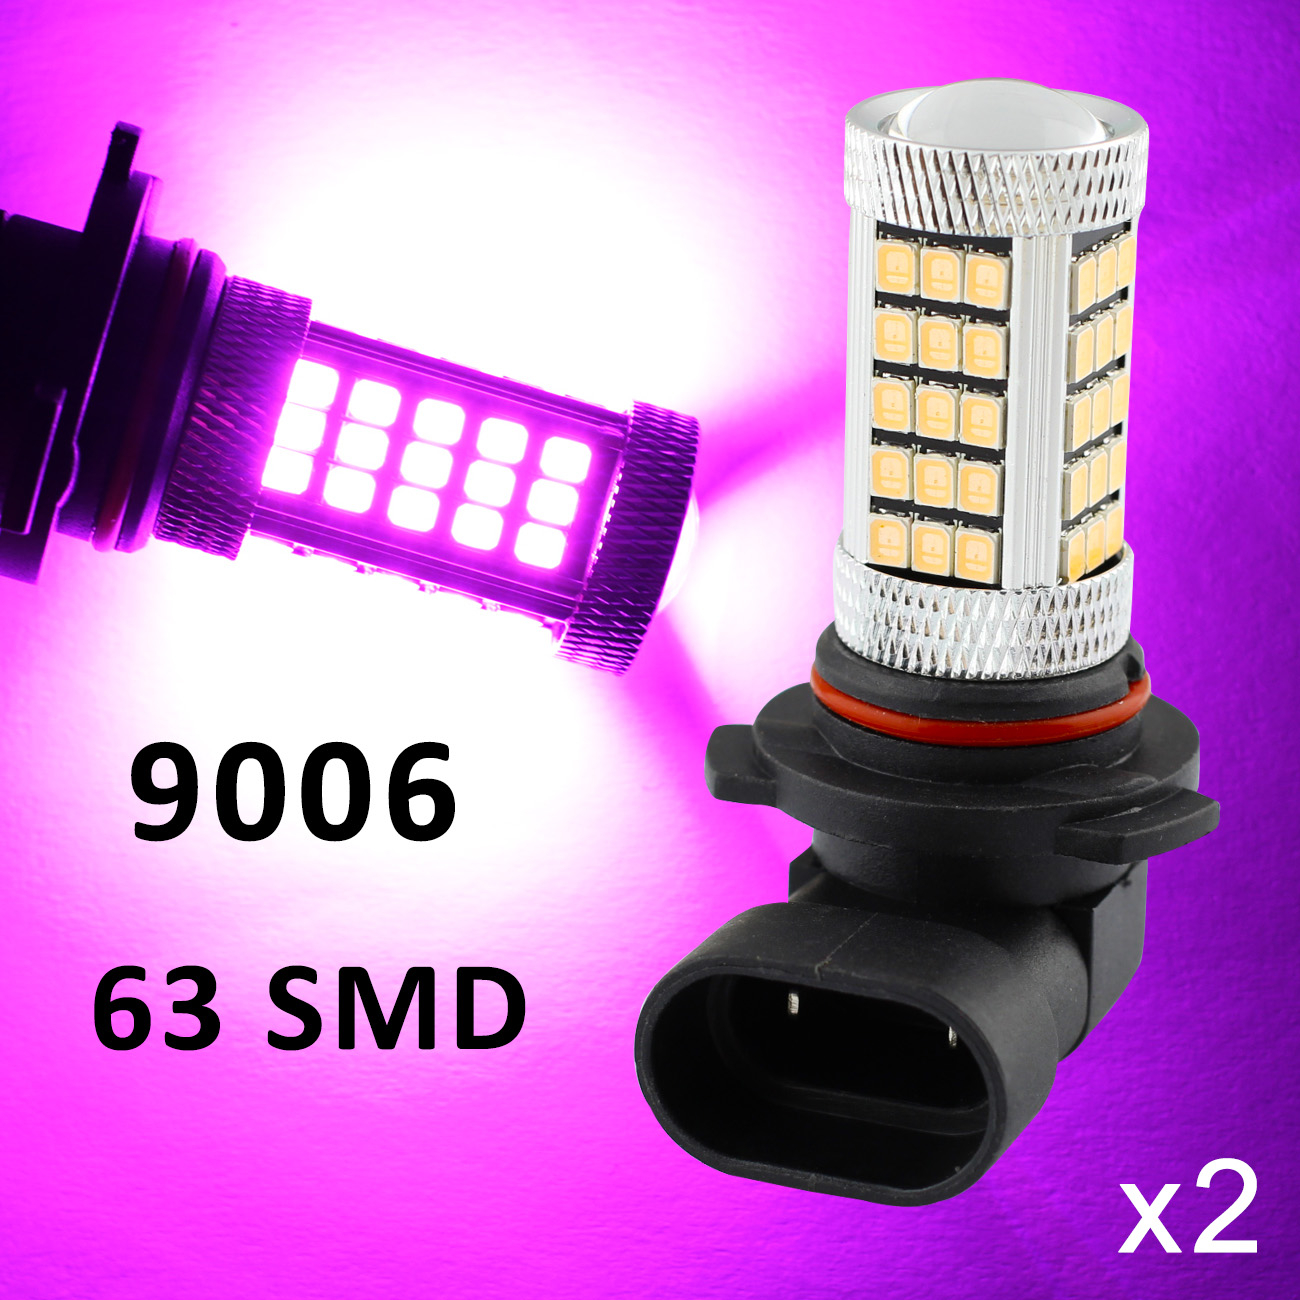 2X Auto LED Foglight Lamp Part 9006 9006HP 9006XS 9012 HB4 Bulbs Lens Fog Driving Light